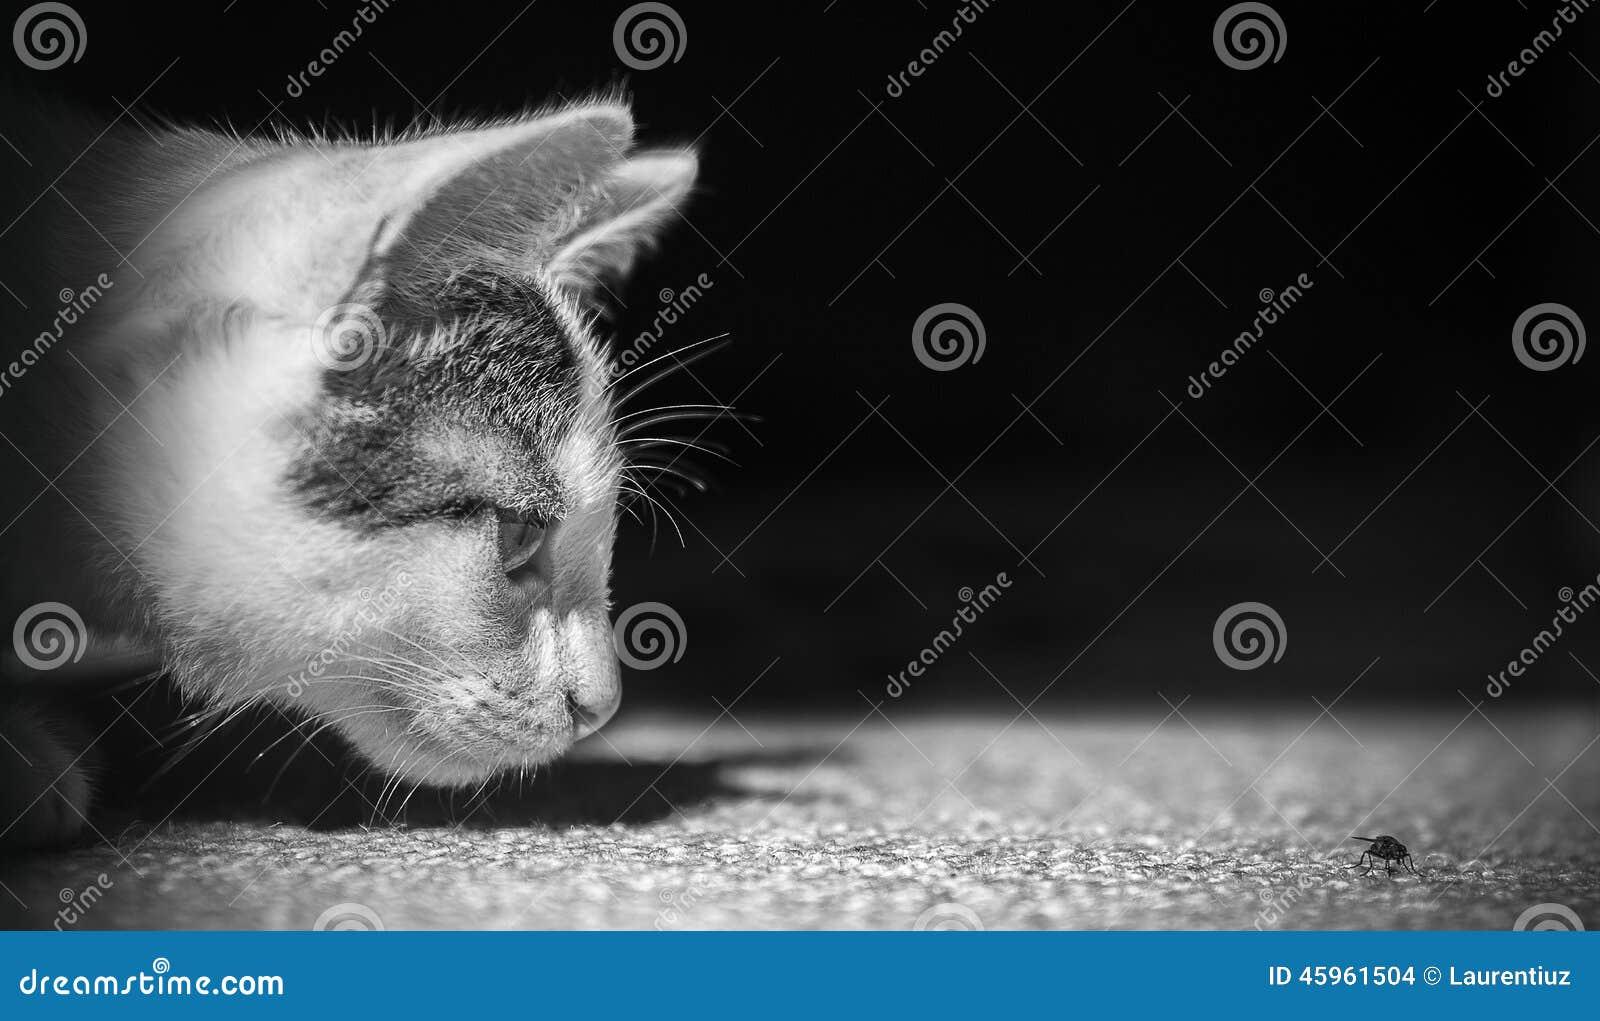 Cat hunt pet animal fly catch